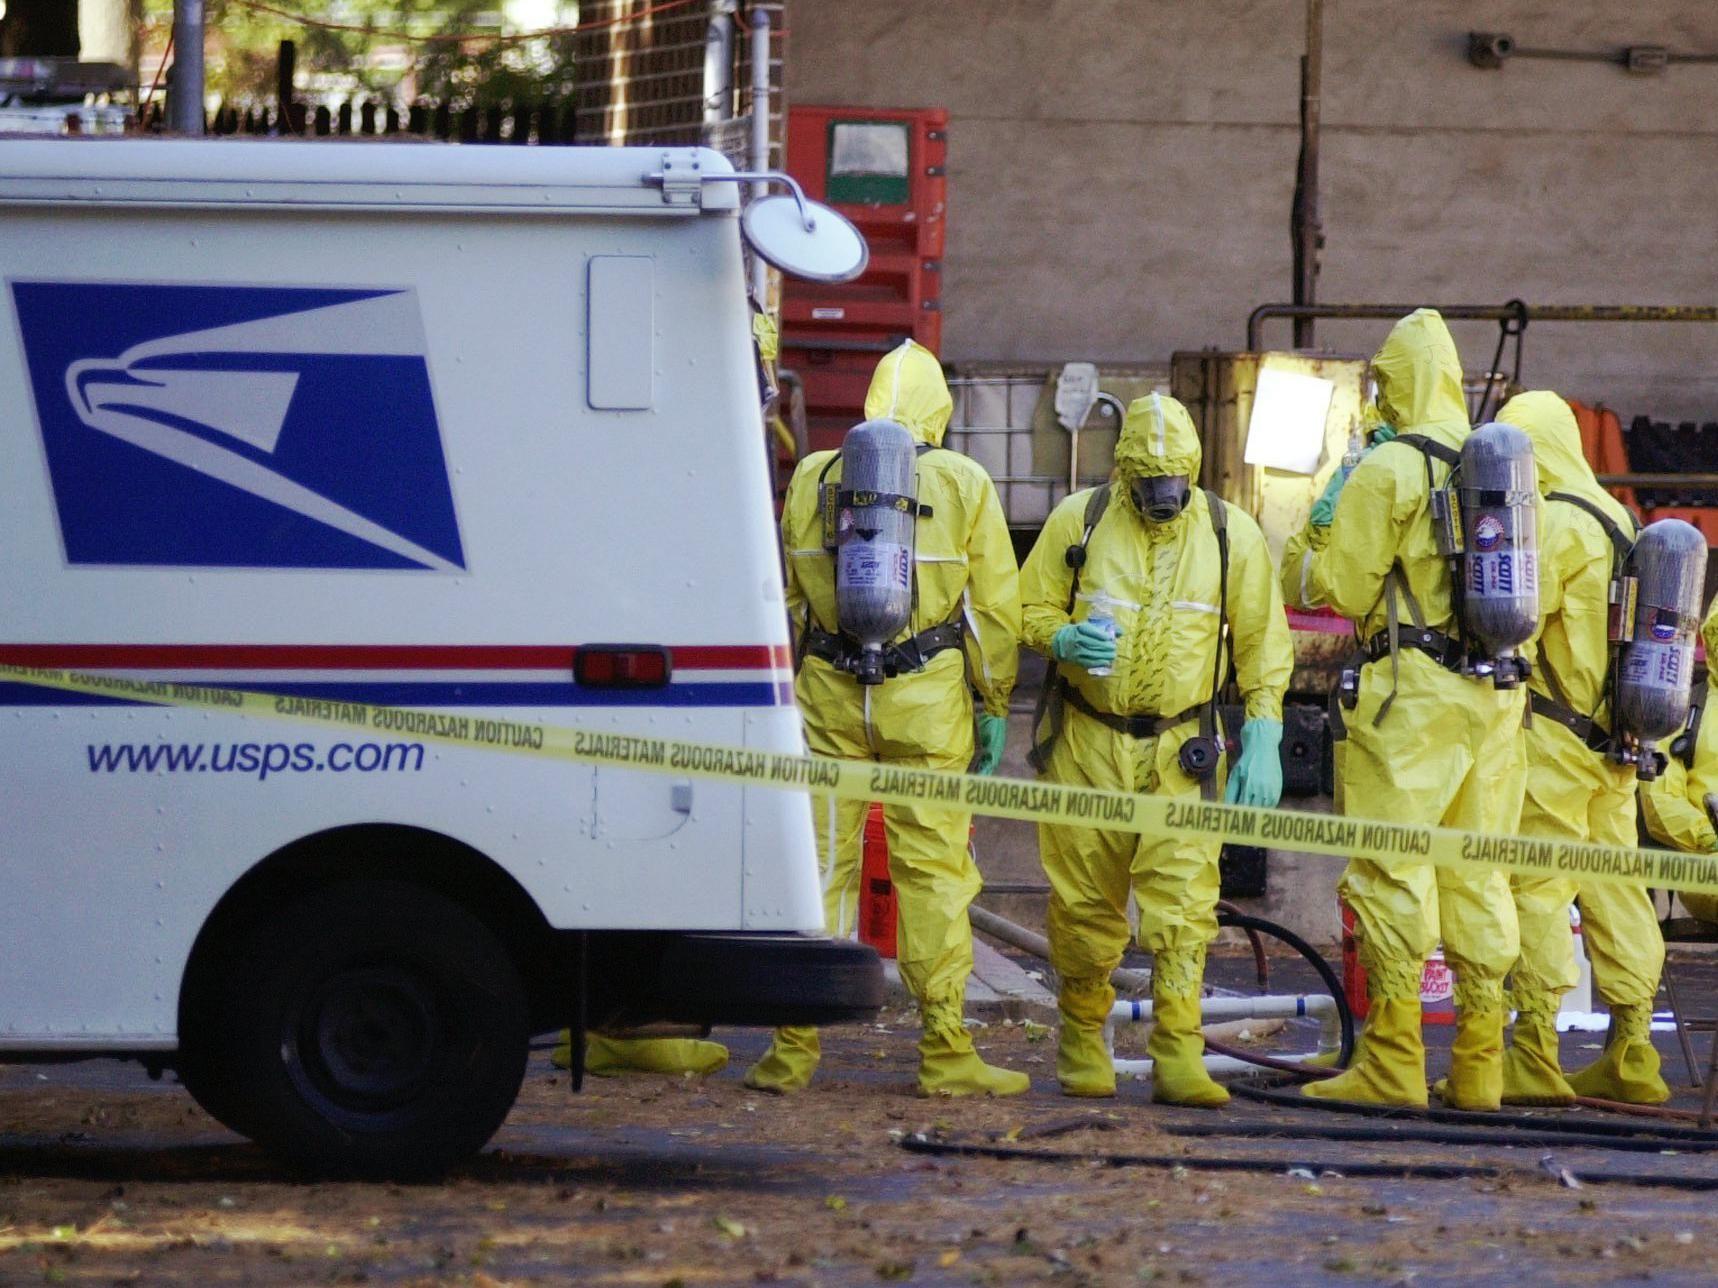 Image of a hazmat team outside a post office.